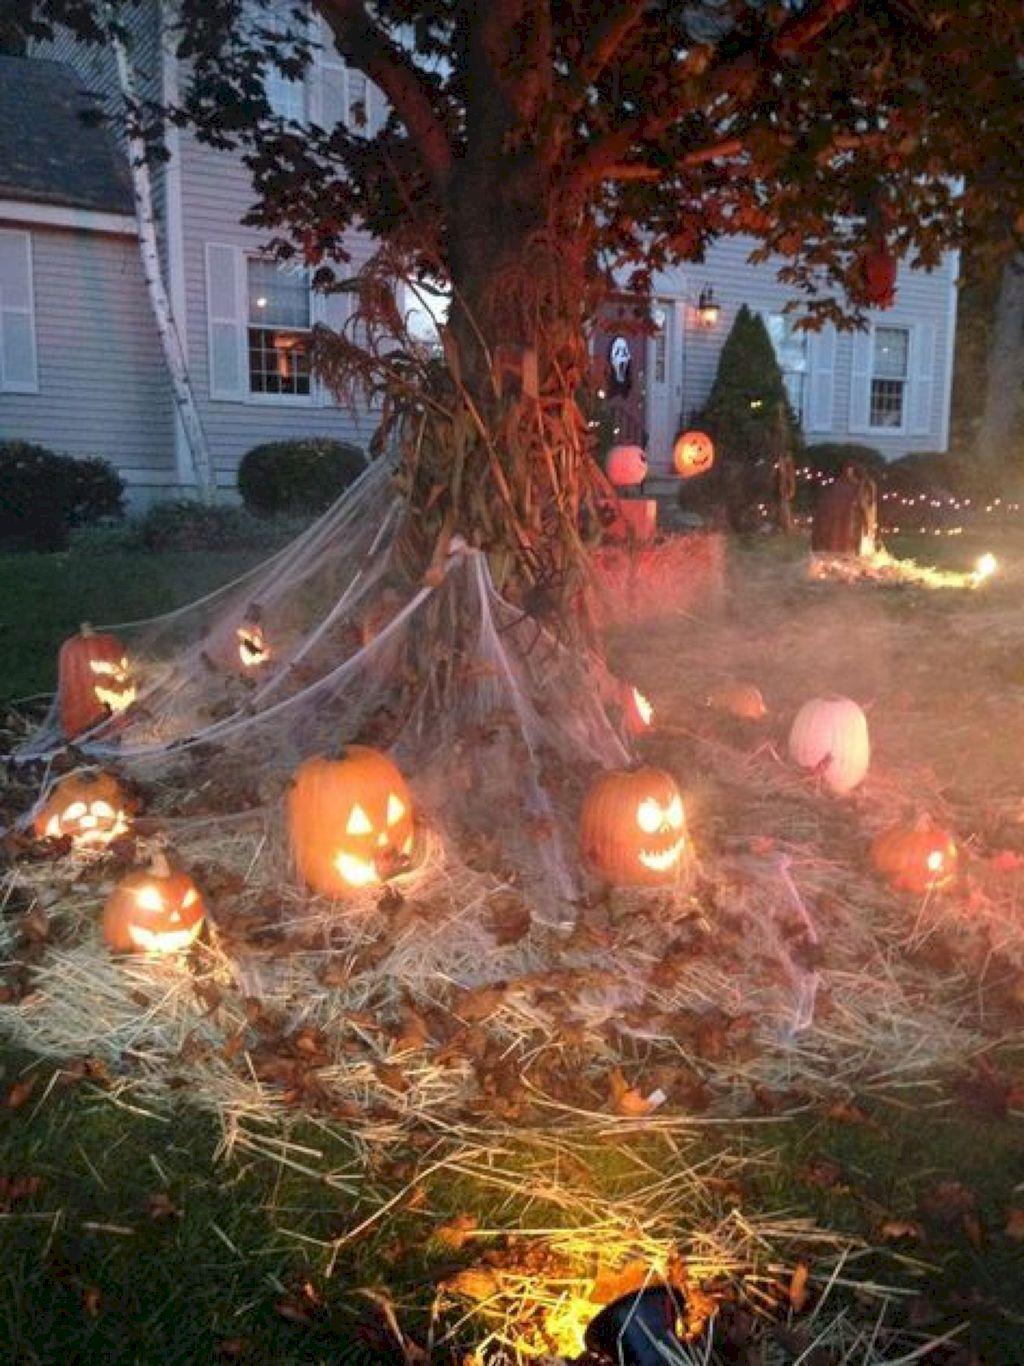 70 Crafty Diy Outdoor Halloween Decorating Ideas Diy Halloween Decorations Outdoor Halloween Halloween Party Decor